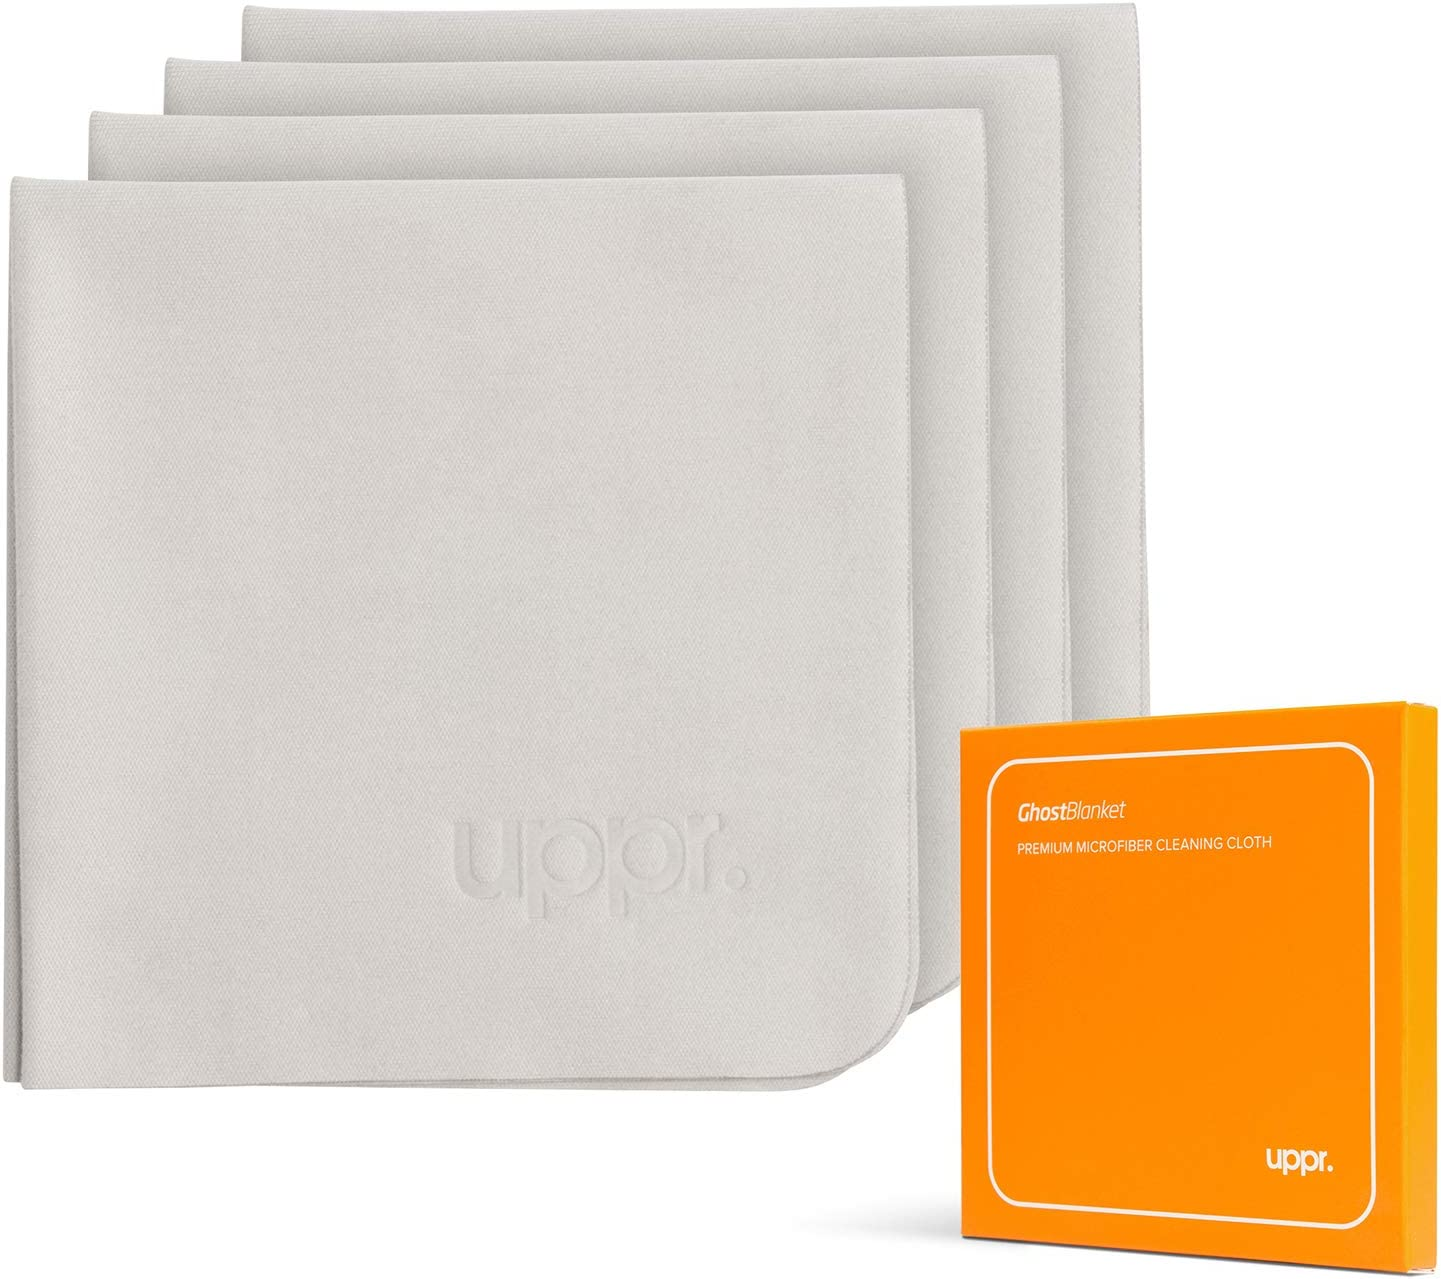 Paños de microfibra para pantallas 16 x 16 cm (Pack de 4)